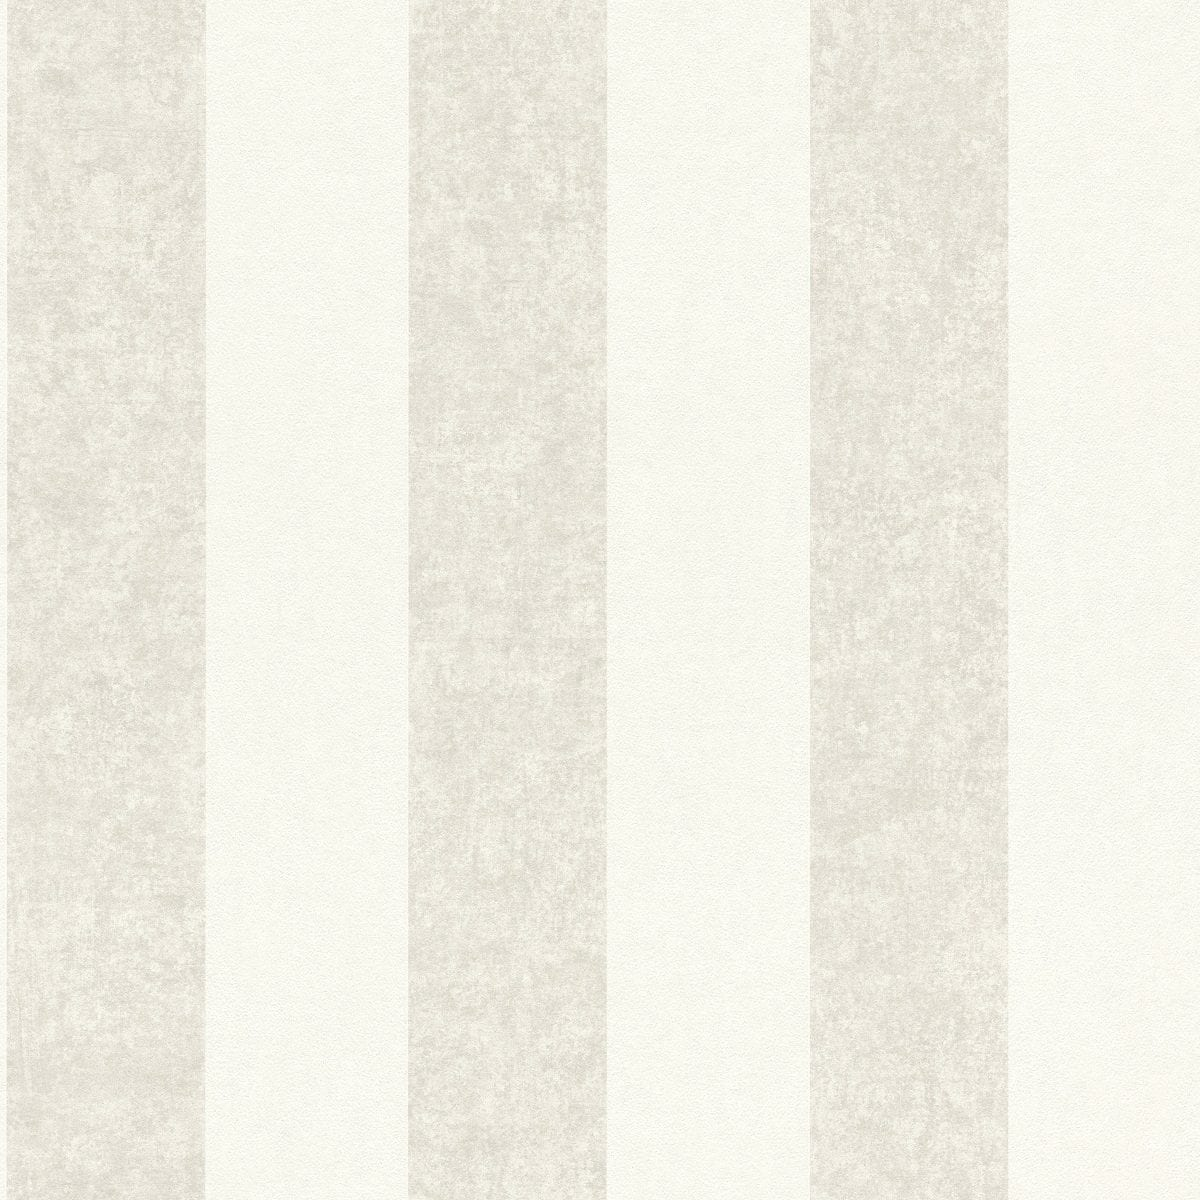 Papel mural rayas blanco y beige KERALA 551600 RASCH